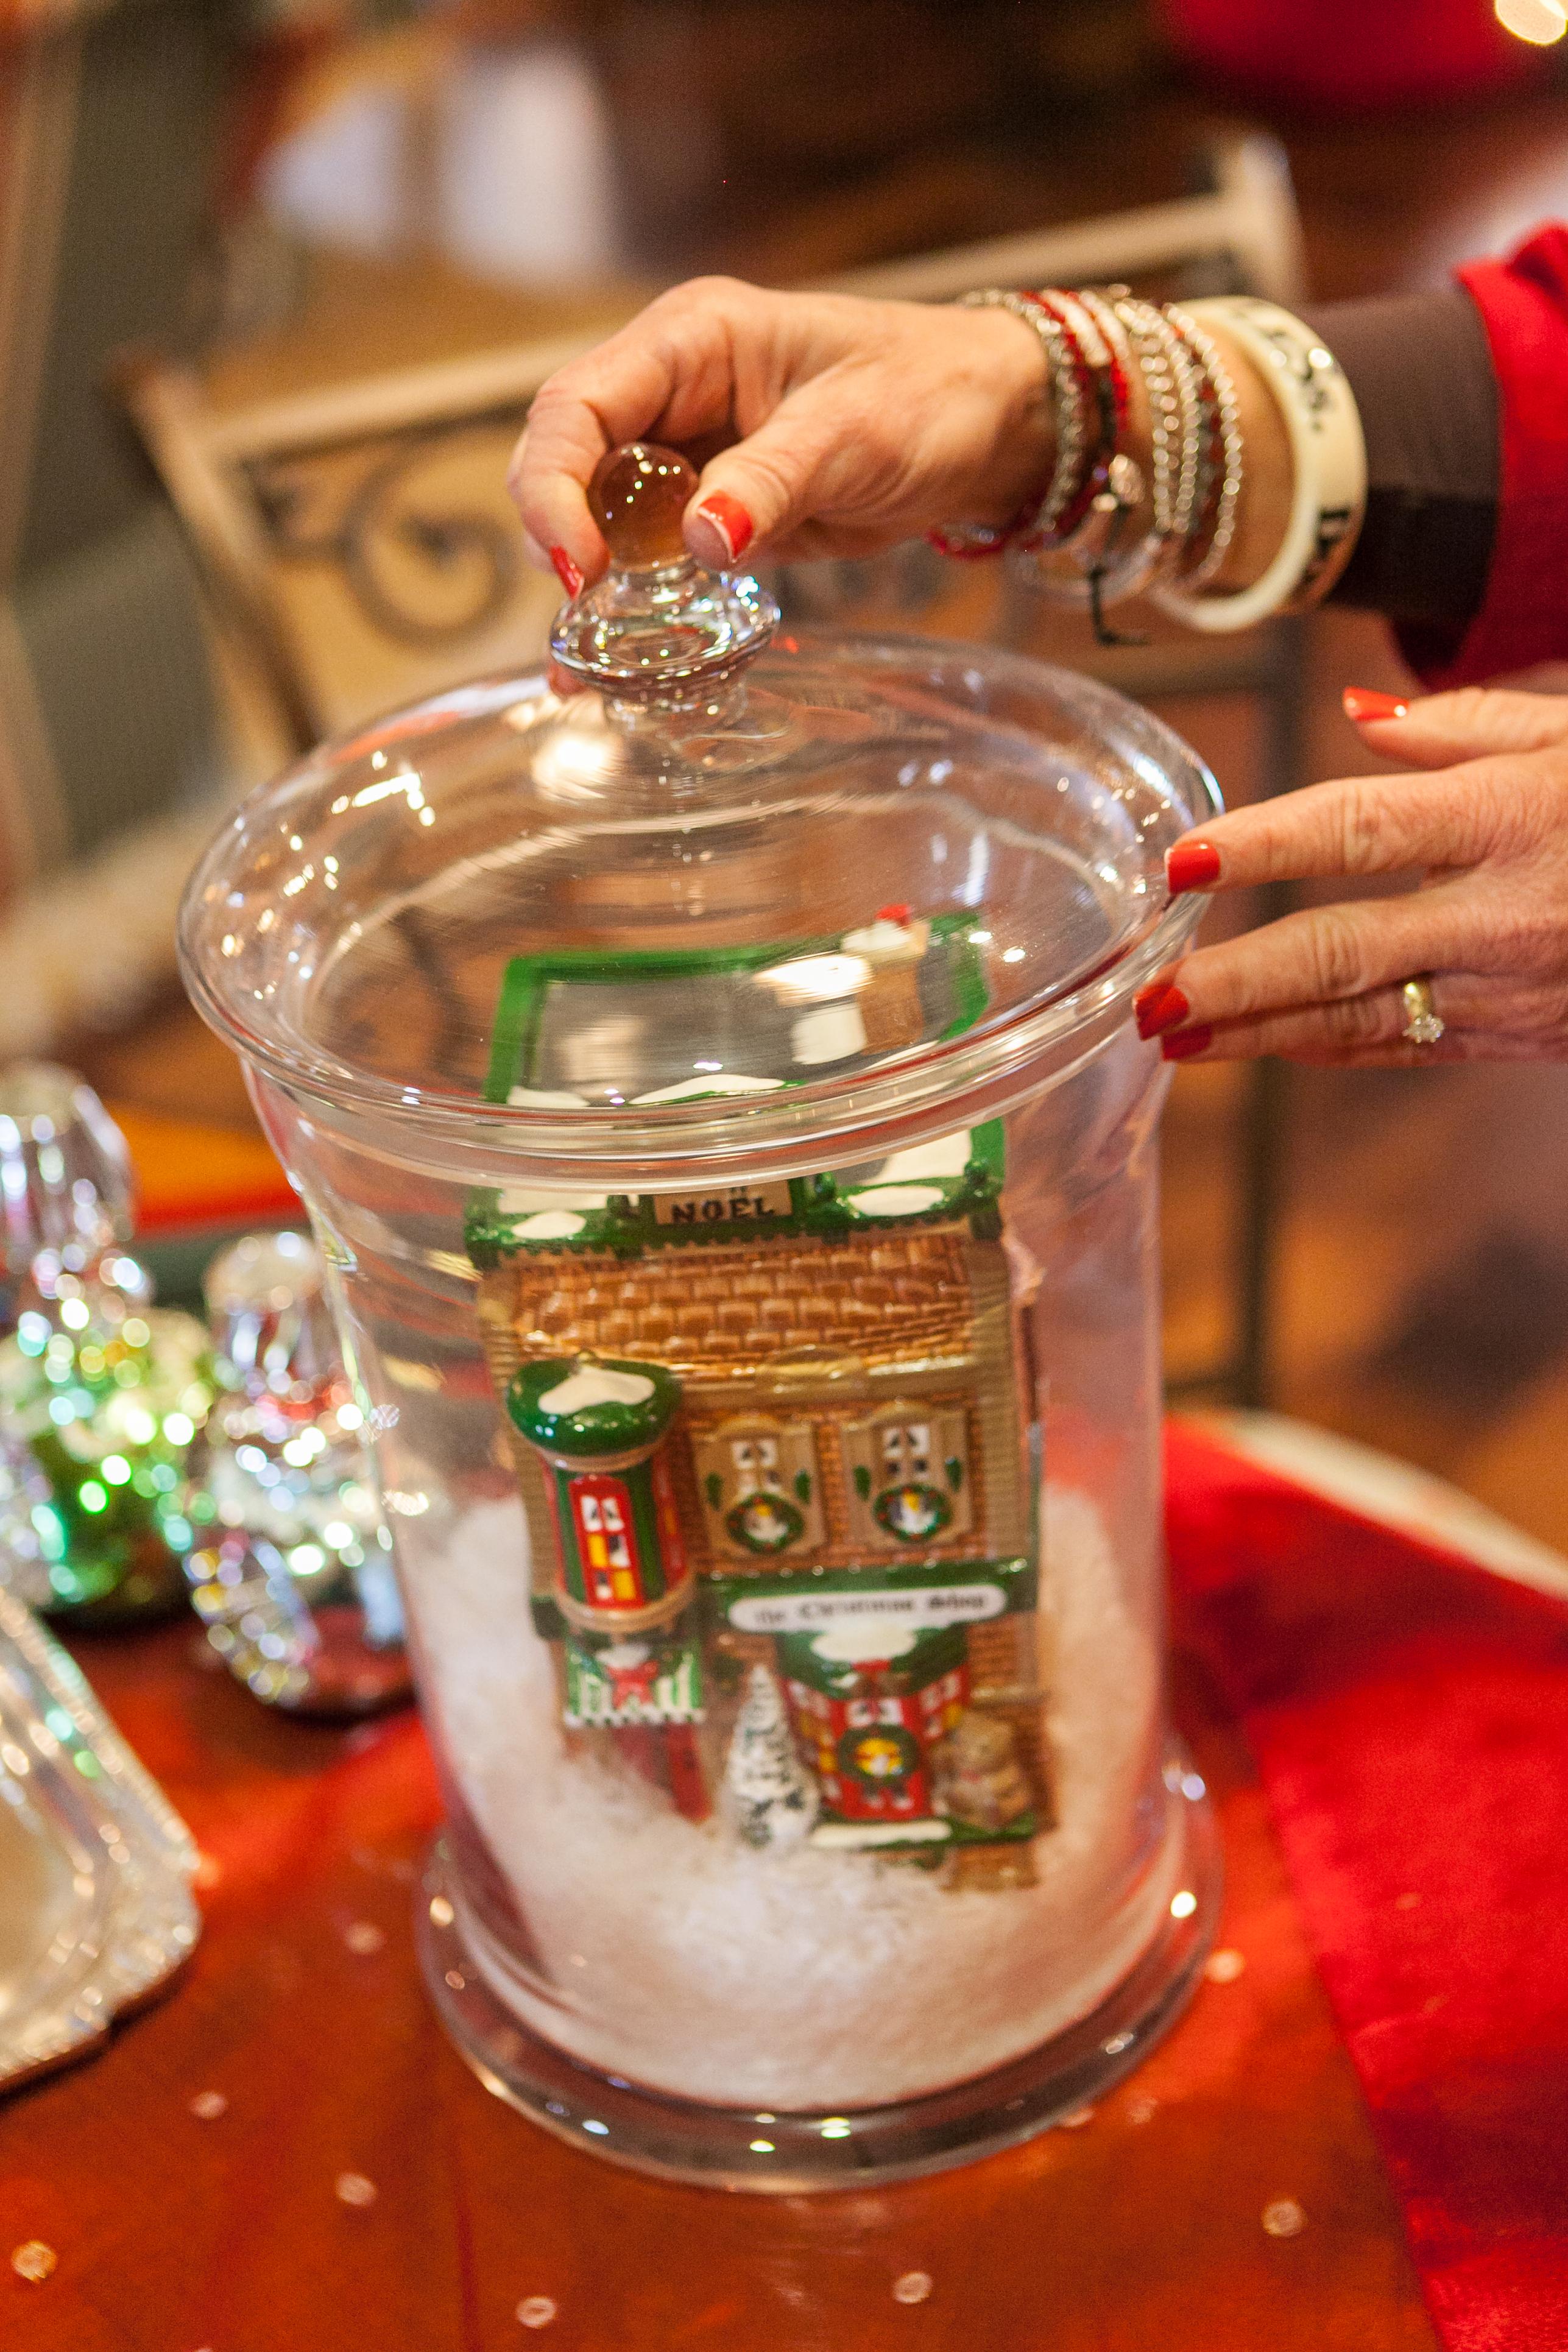 Christmas Decorating Ideas For Glass Jars : Show me a quick dept village christmas centerpiece